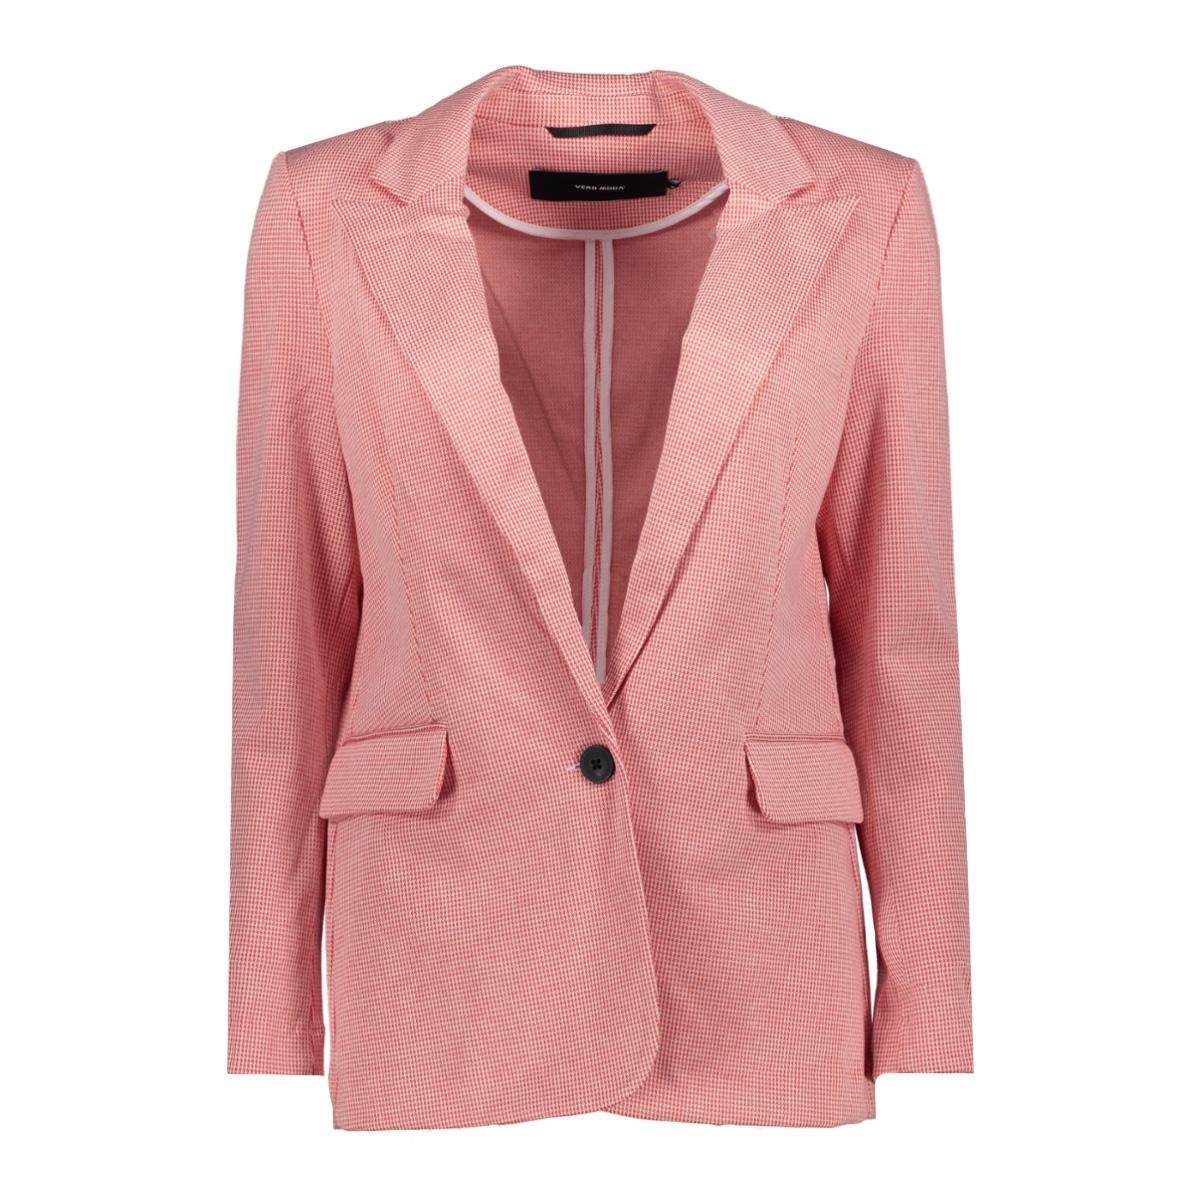 vmtoni 7/8 blazer 10211601 vero moda blazer fiery red/with prist